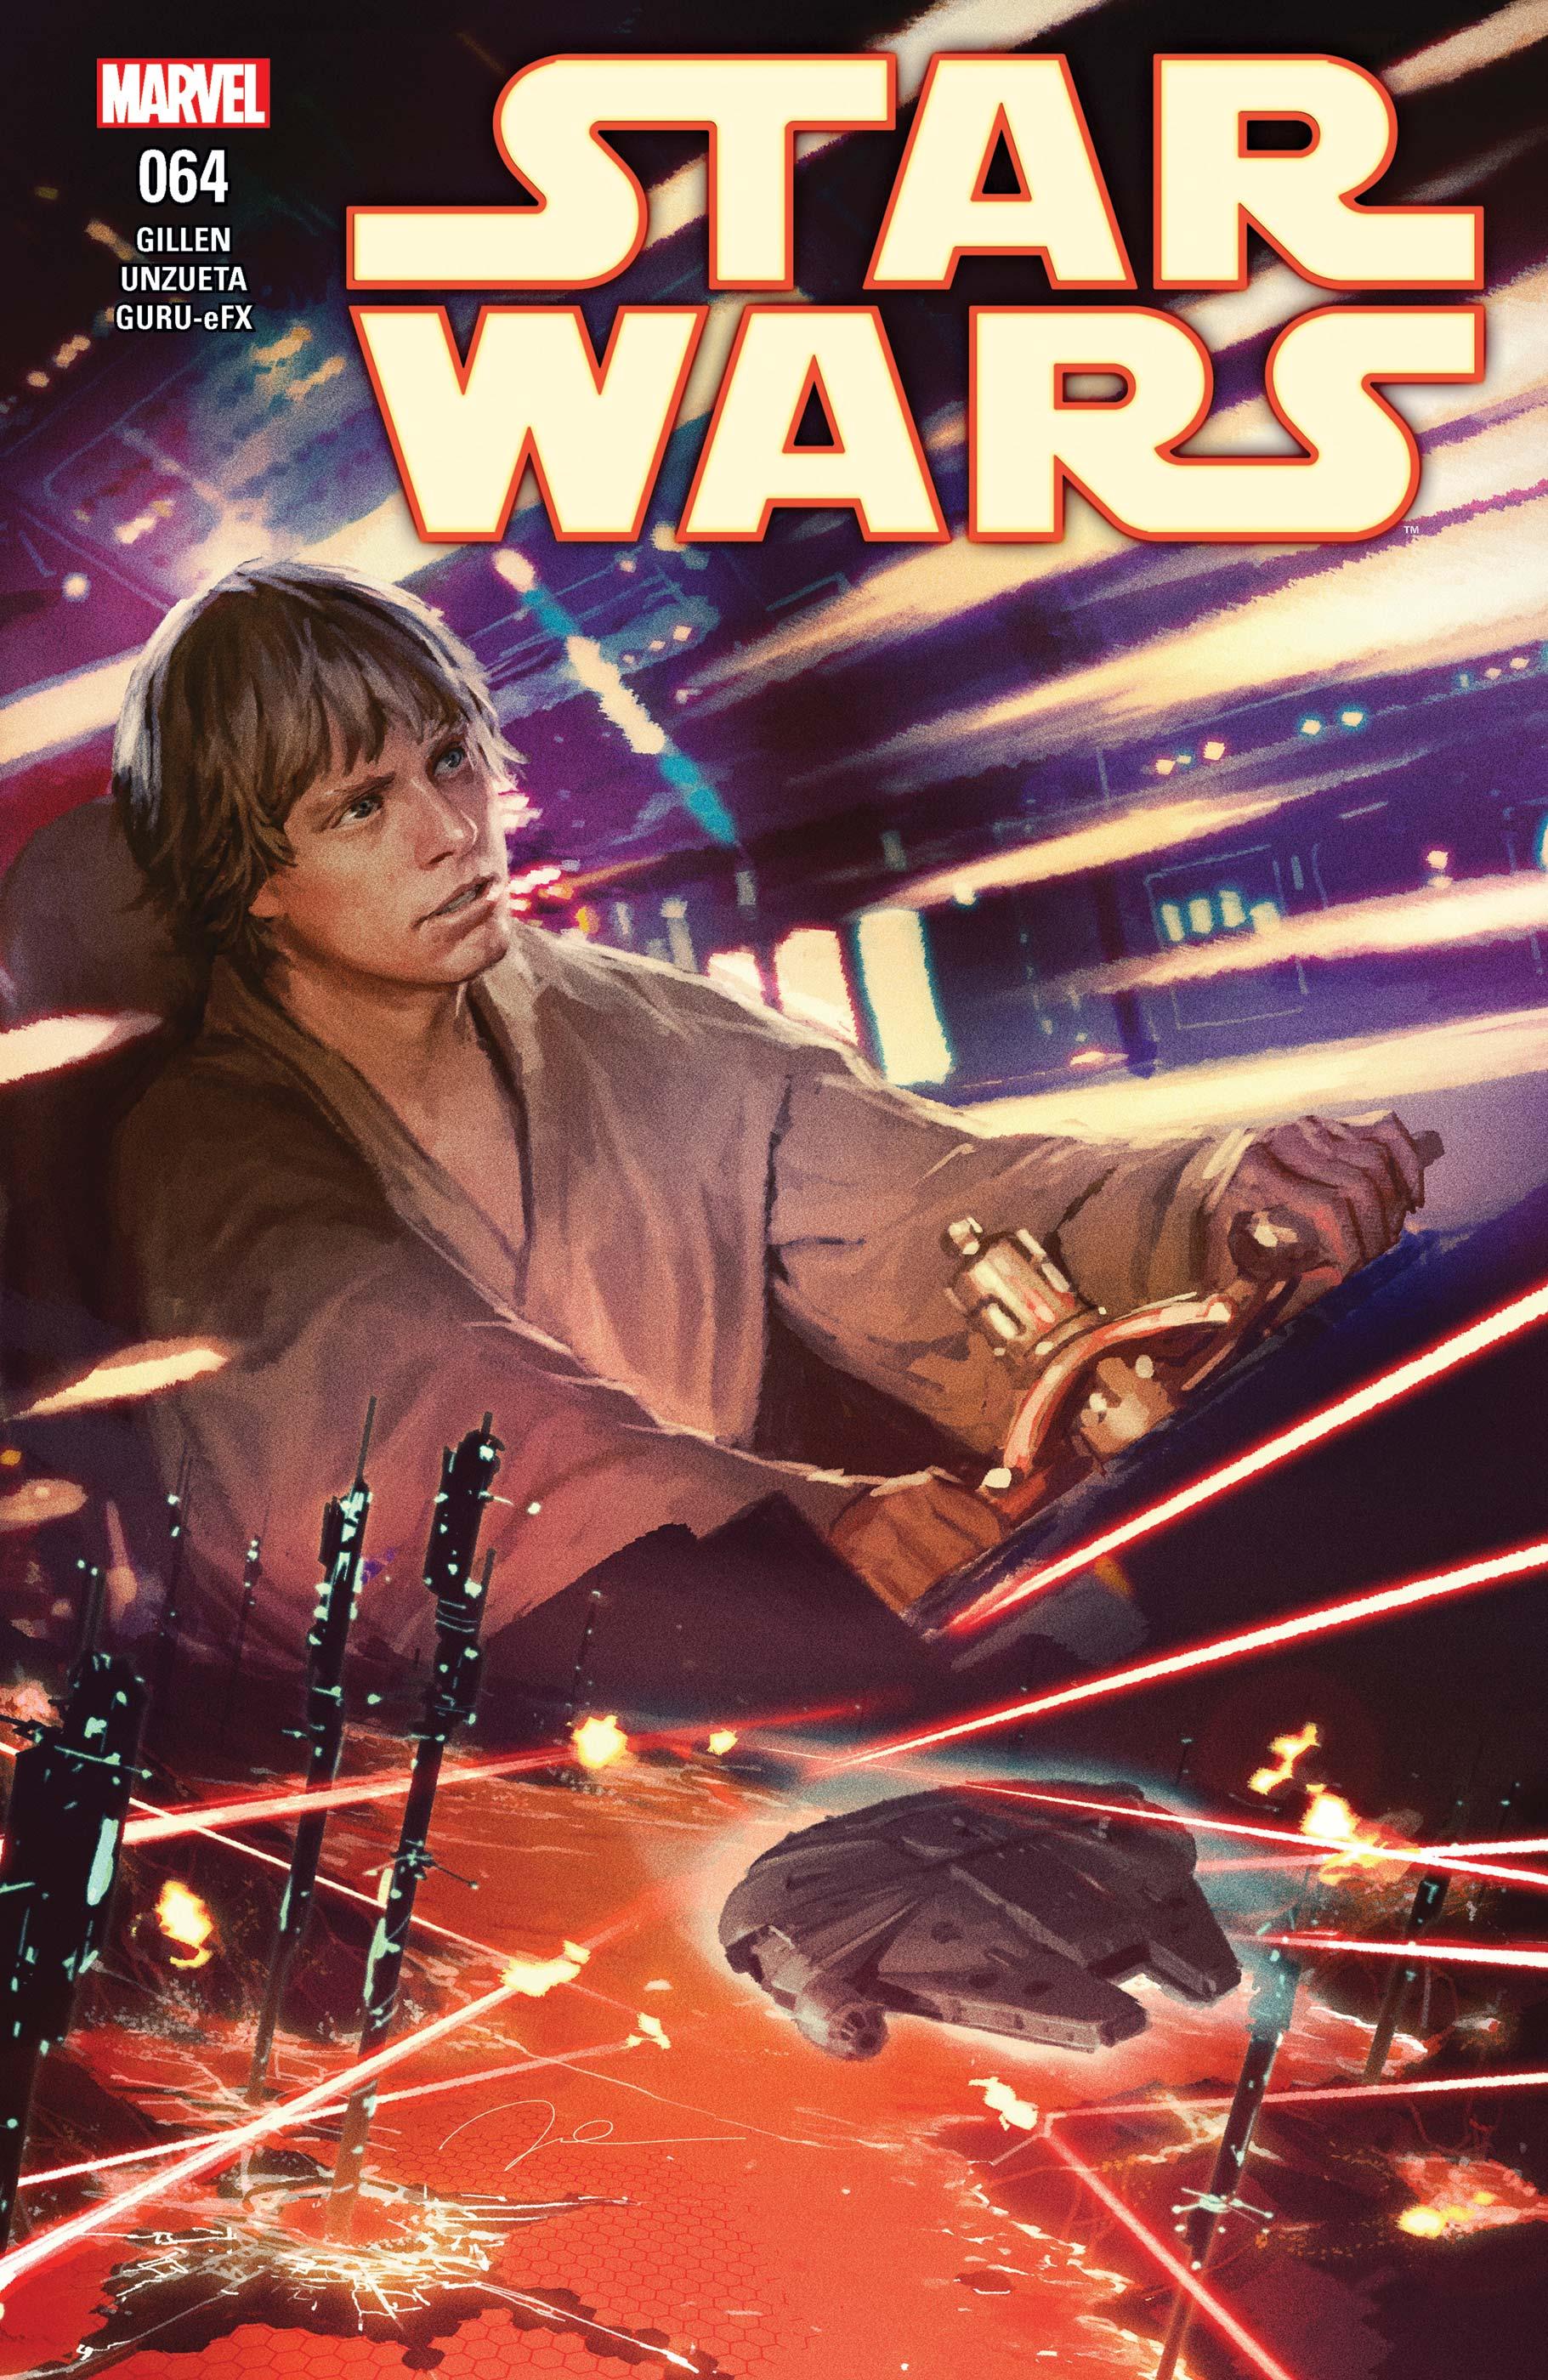 Star Wars (2015) #64